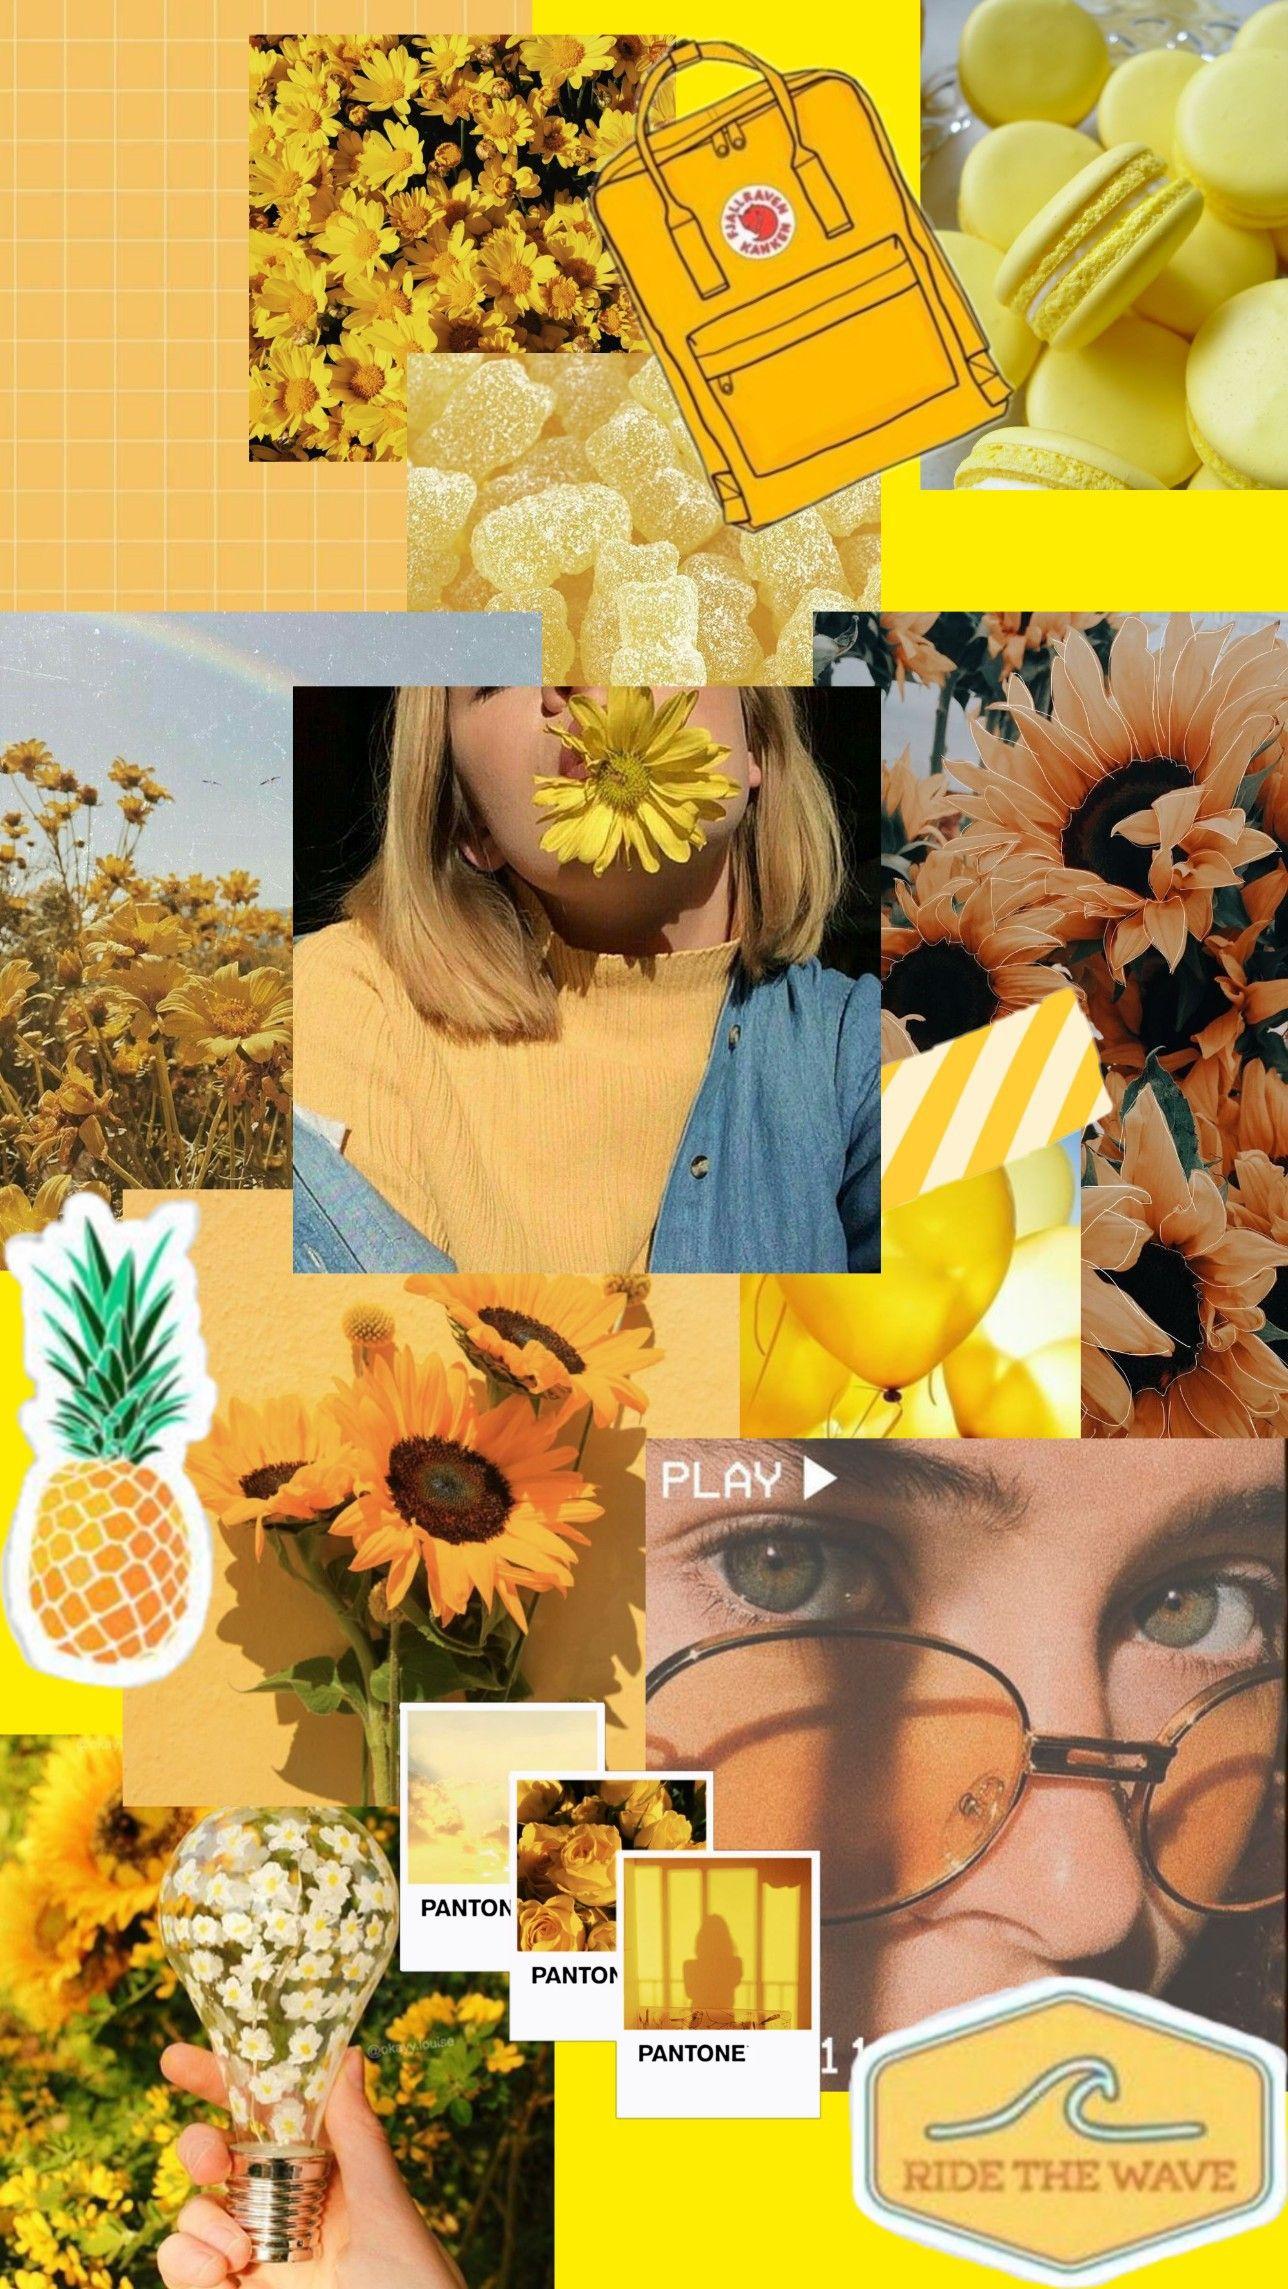 Yellow Aesthetic Wallpaper Iphone Wallpaper Yellow Pretty Wallpaper Iphone Yellow Aesthetic Pastel Aesthetic wallpaper collage yellow